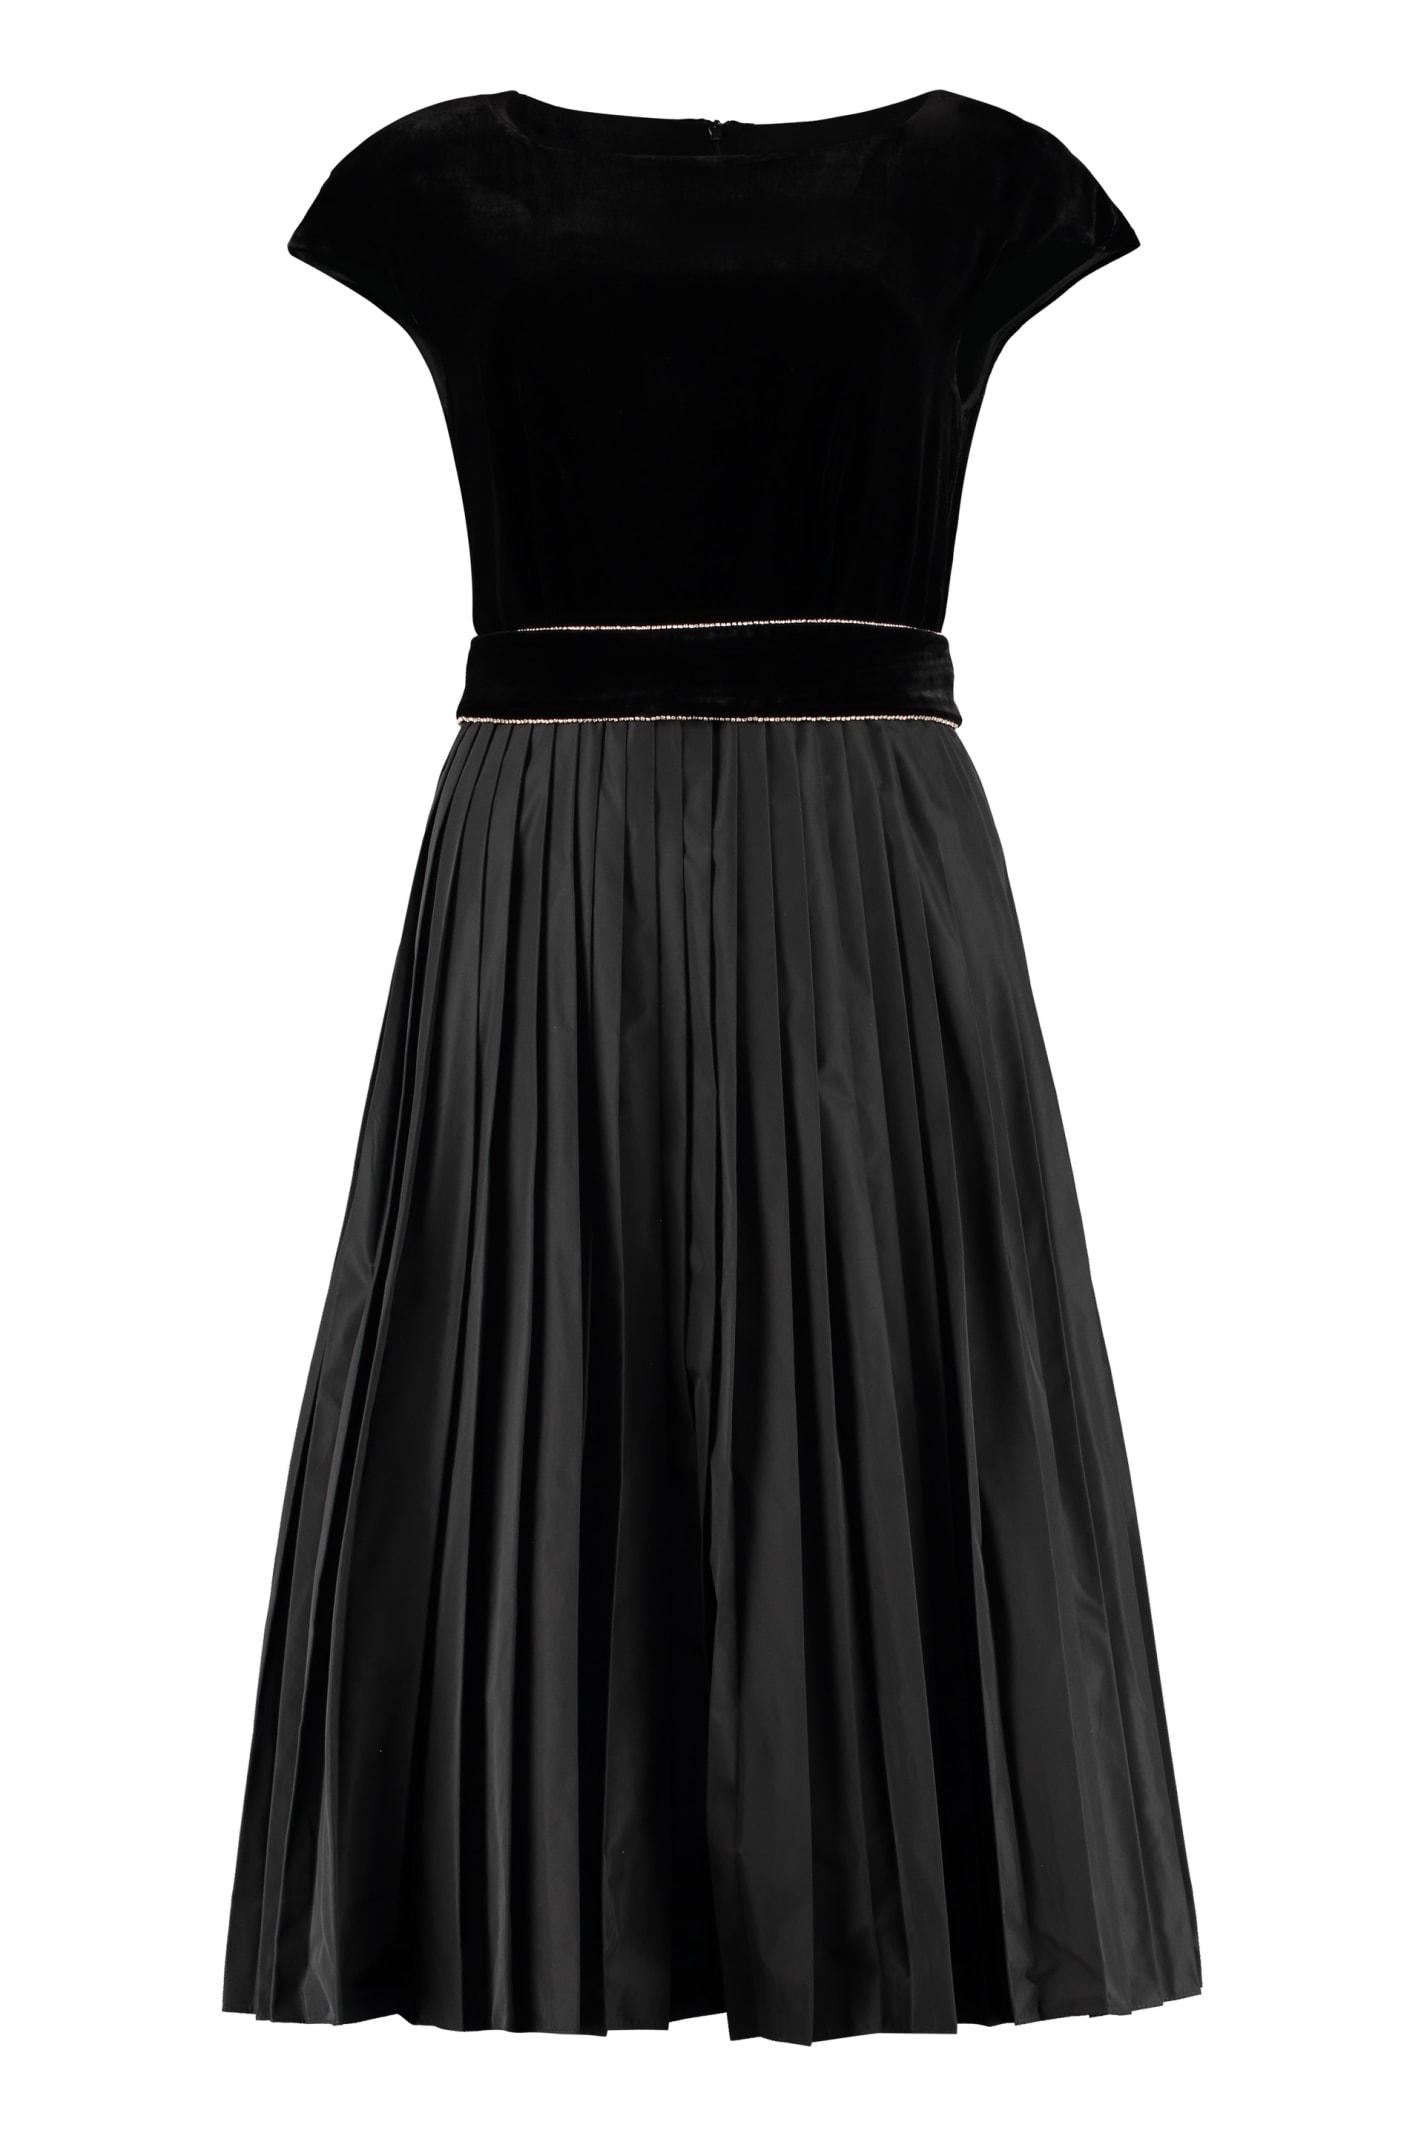 Buy Max Mara Studio Austero Pleated Skirt Dress online, shop Max Mara Studio with free shipping